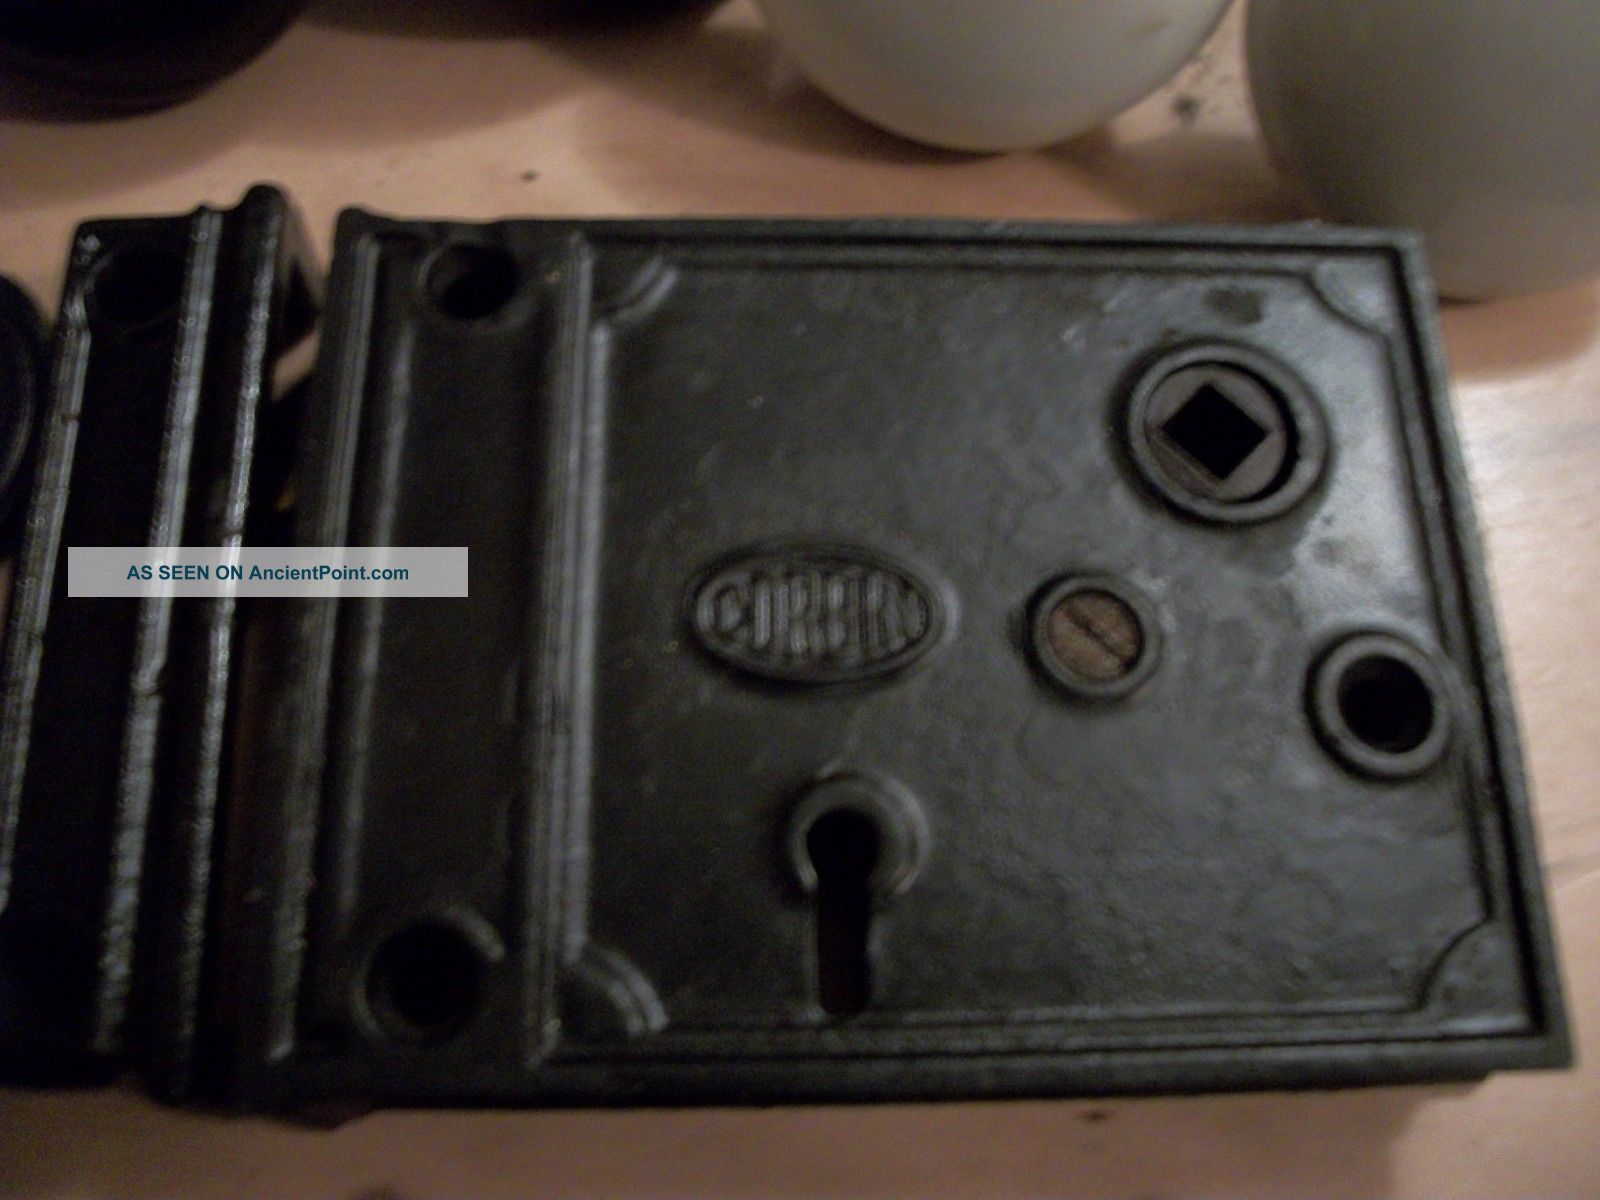 Antique - Old - Vintage - Collectible - Rim Lock - W/ Knobs -,  Keeper - Spindle - Rose - Key Locks & Keys photo